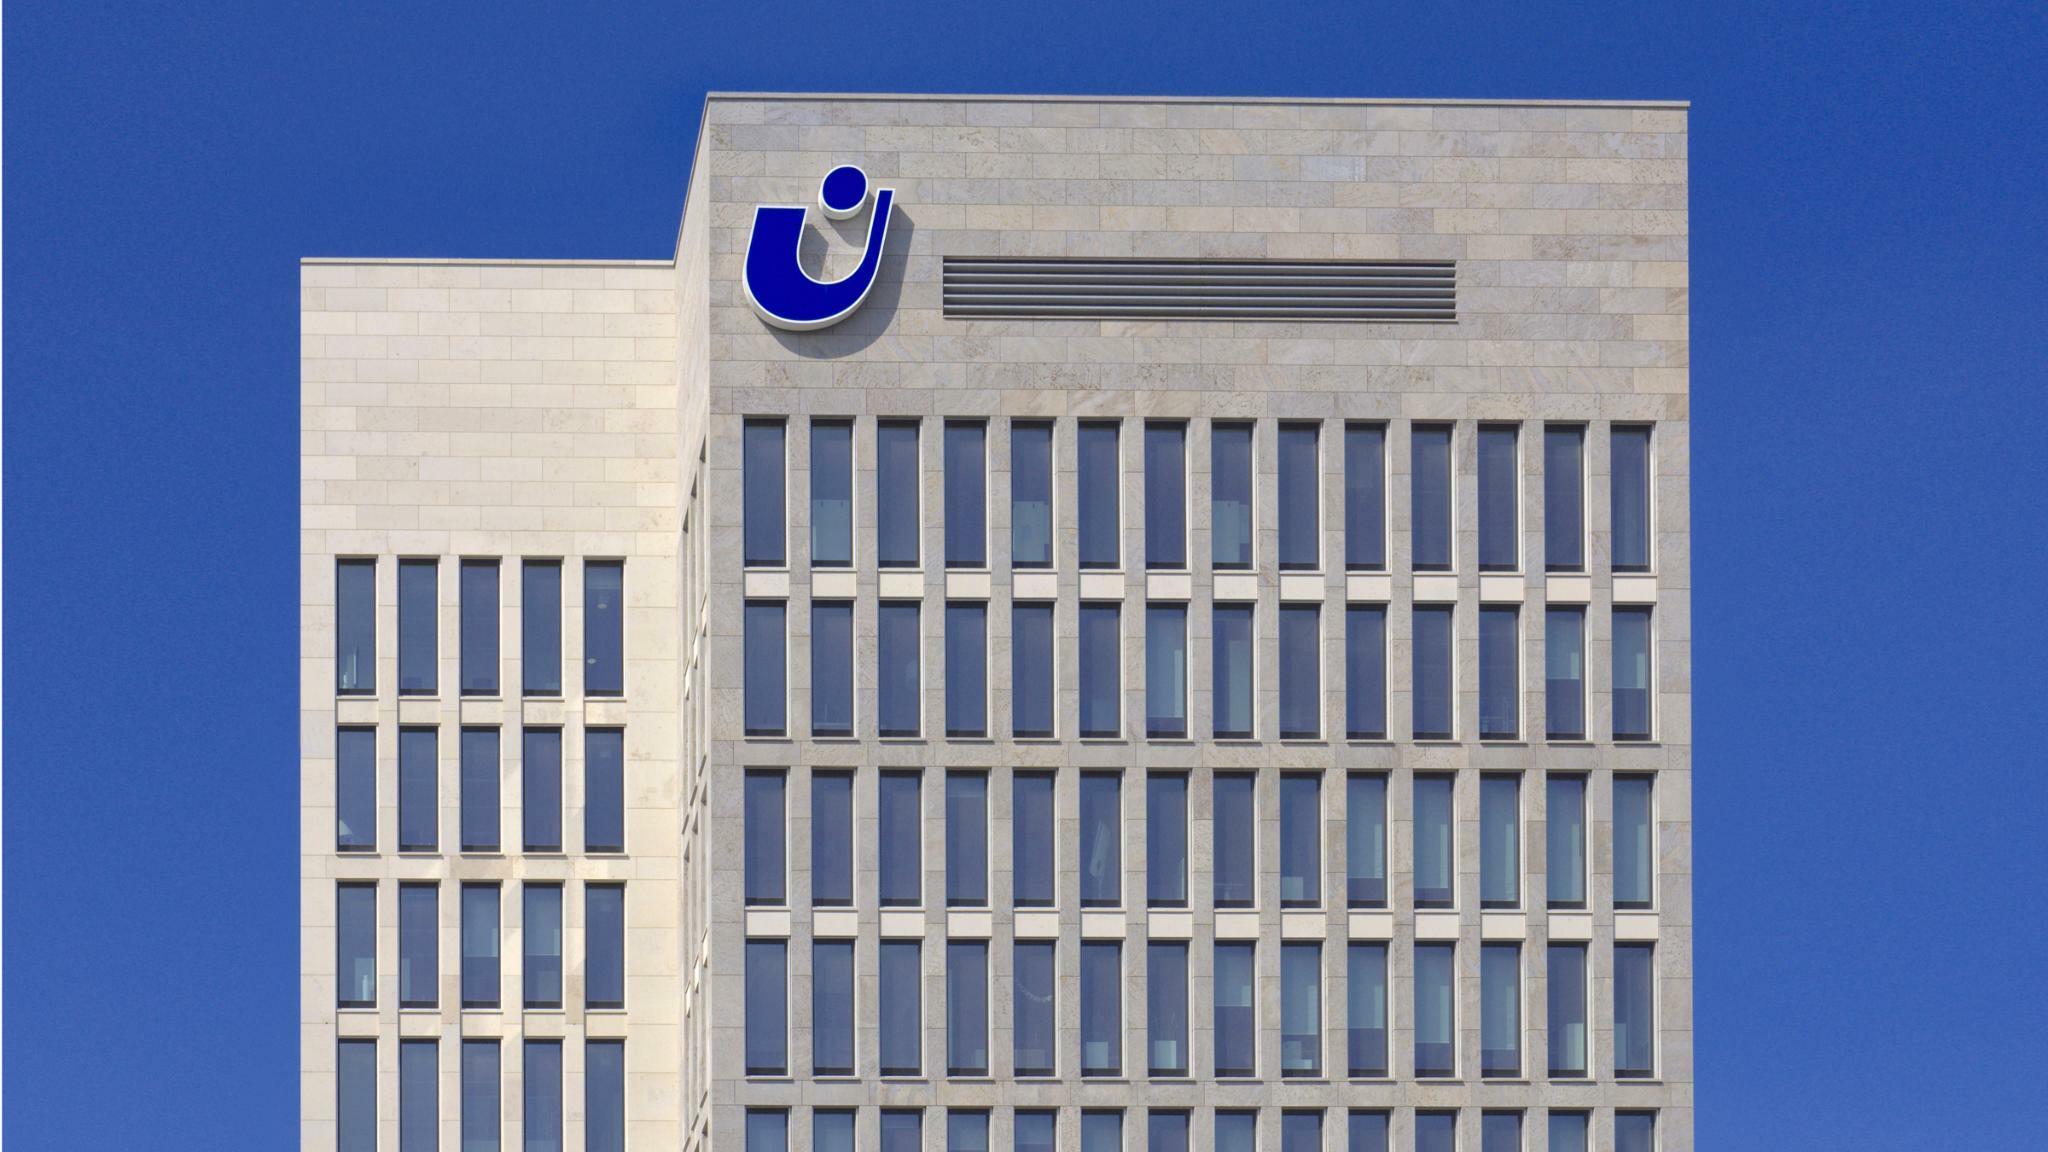 Fondsmanager union investment privatkunden highest return on safe investment